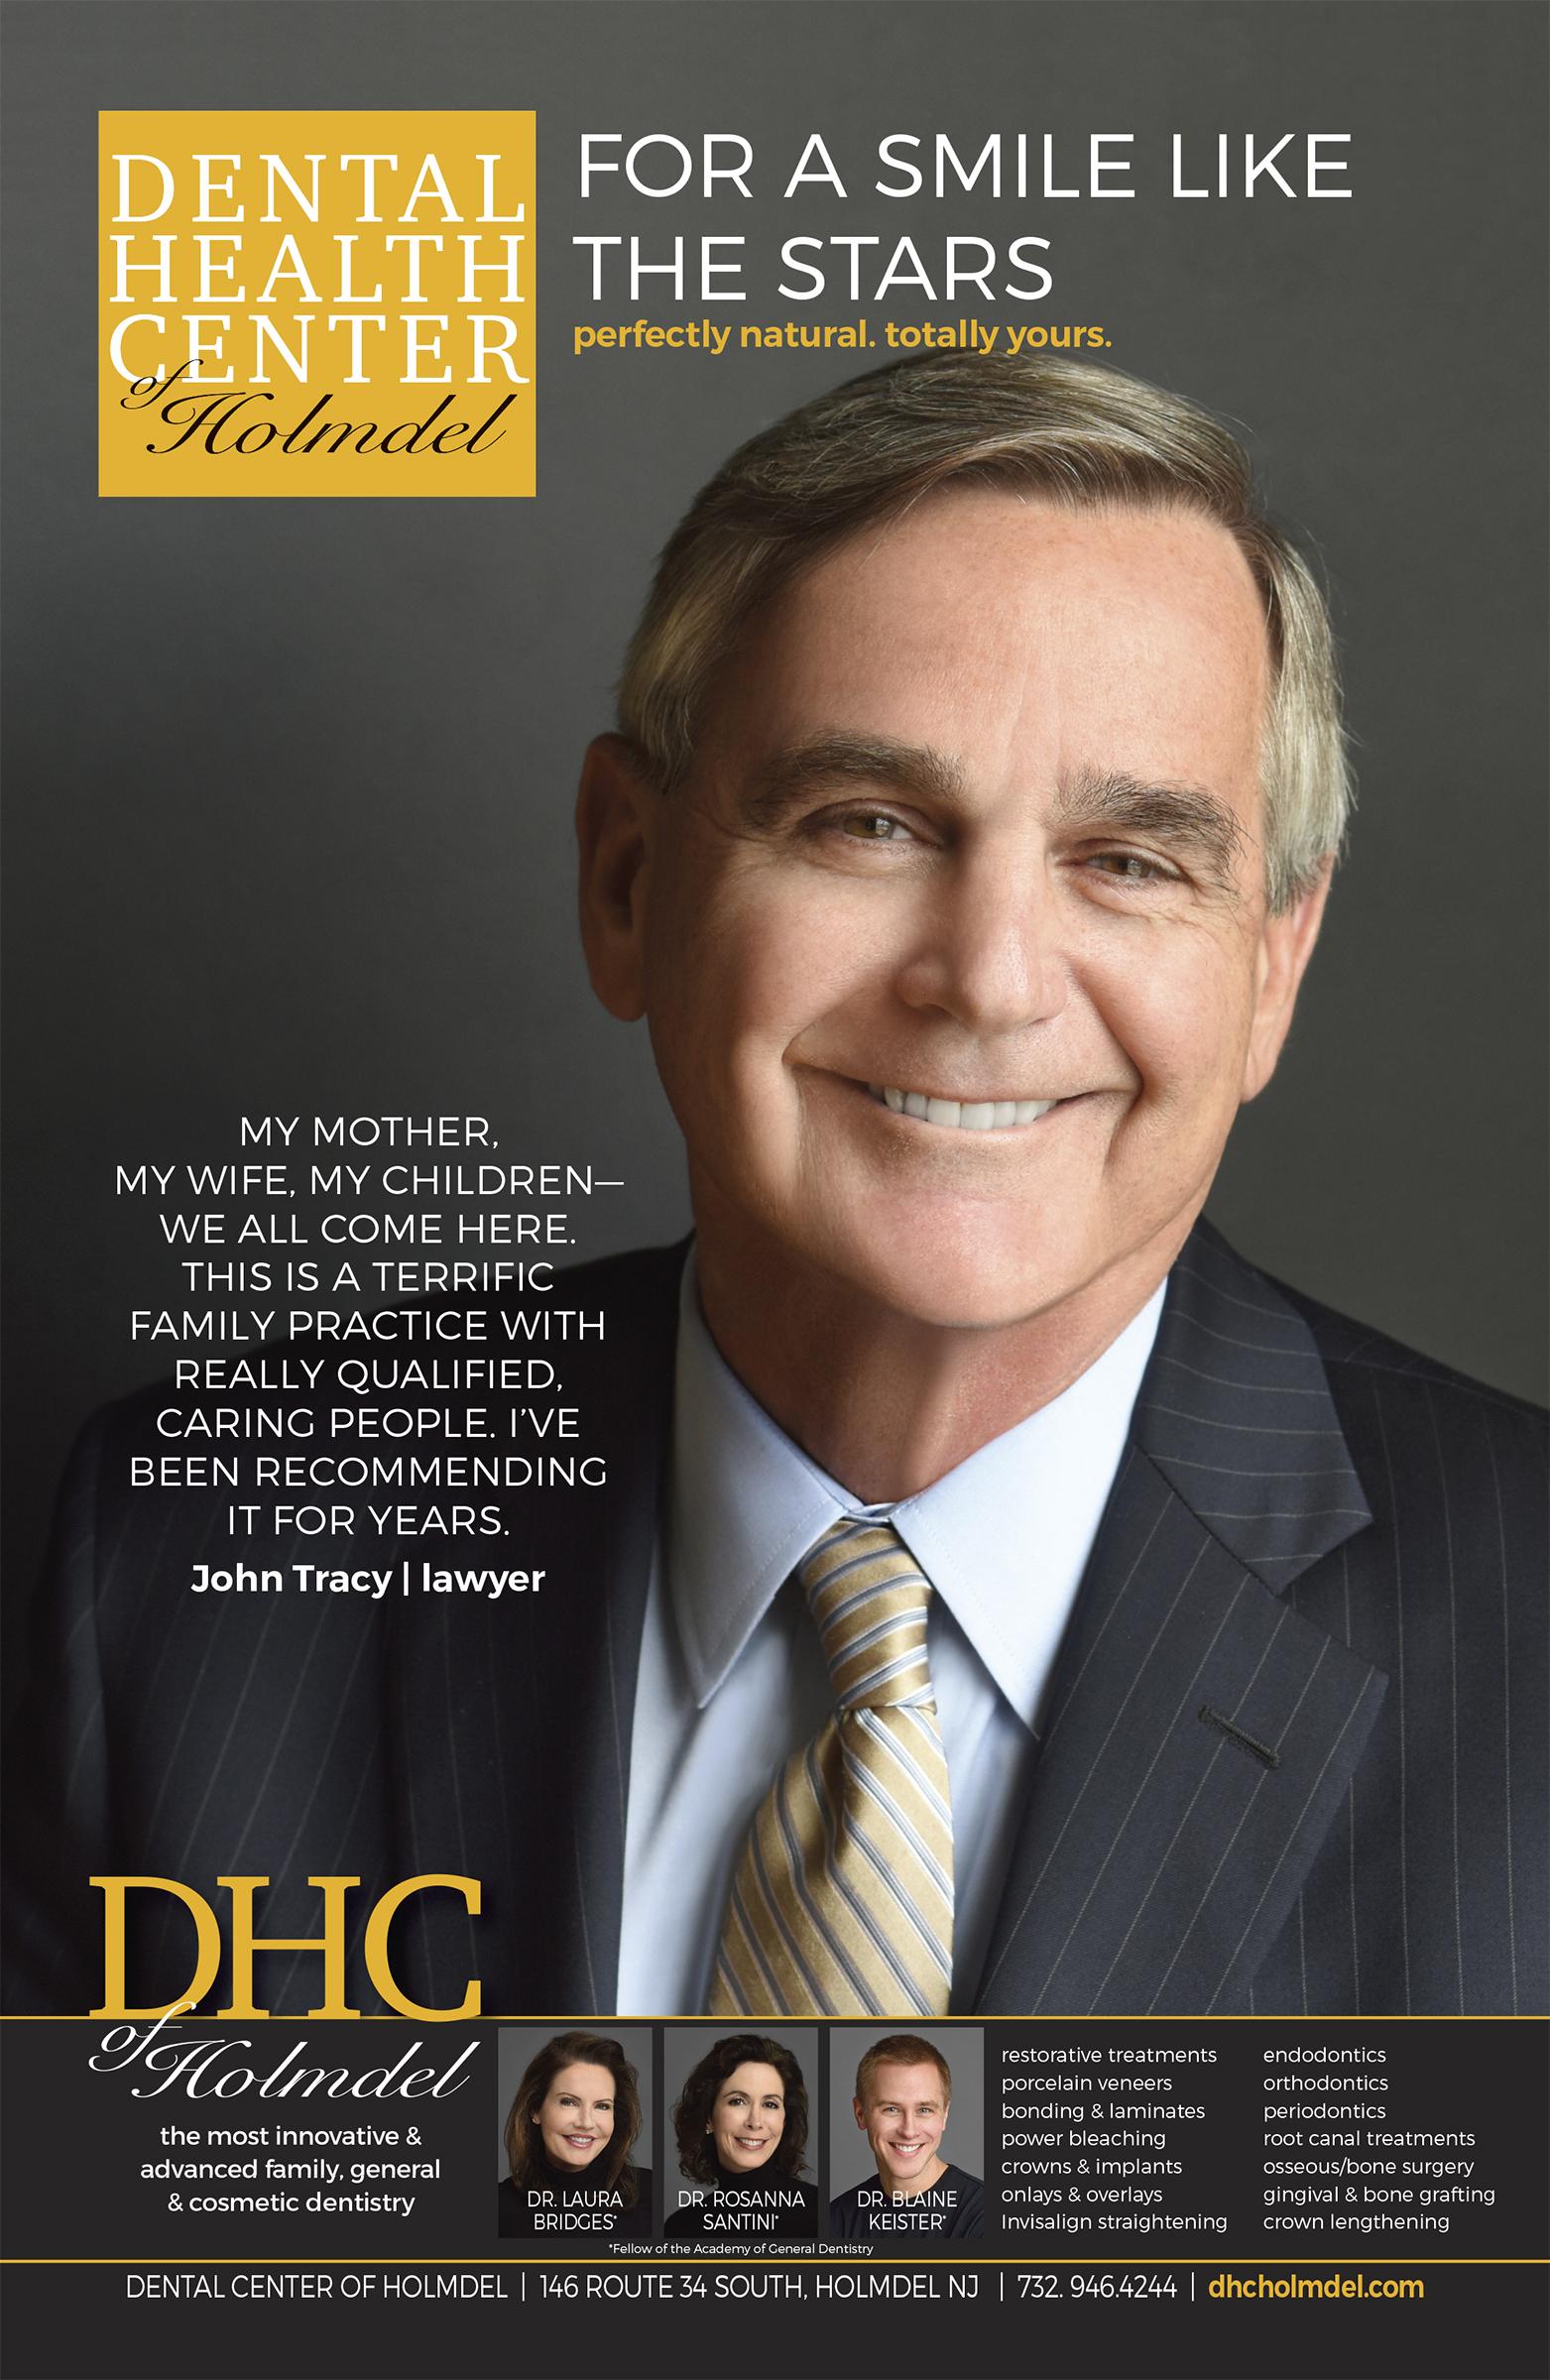 DHC_Testimonal_JohnTracy_ws.jpg